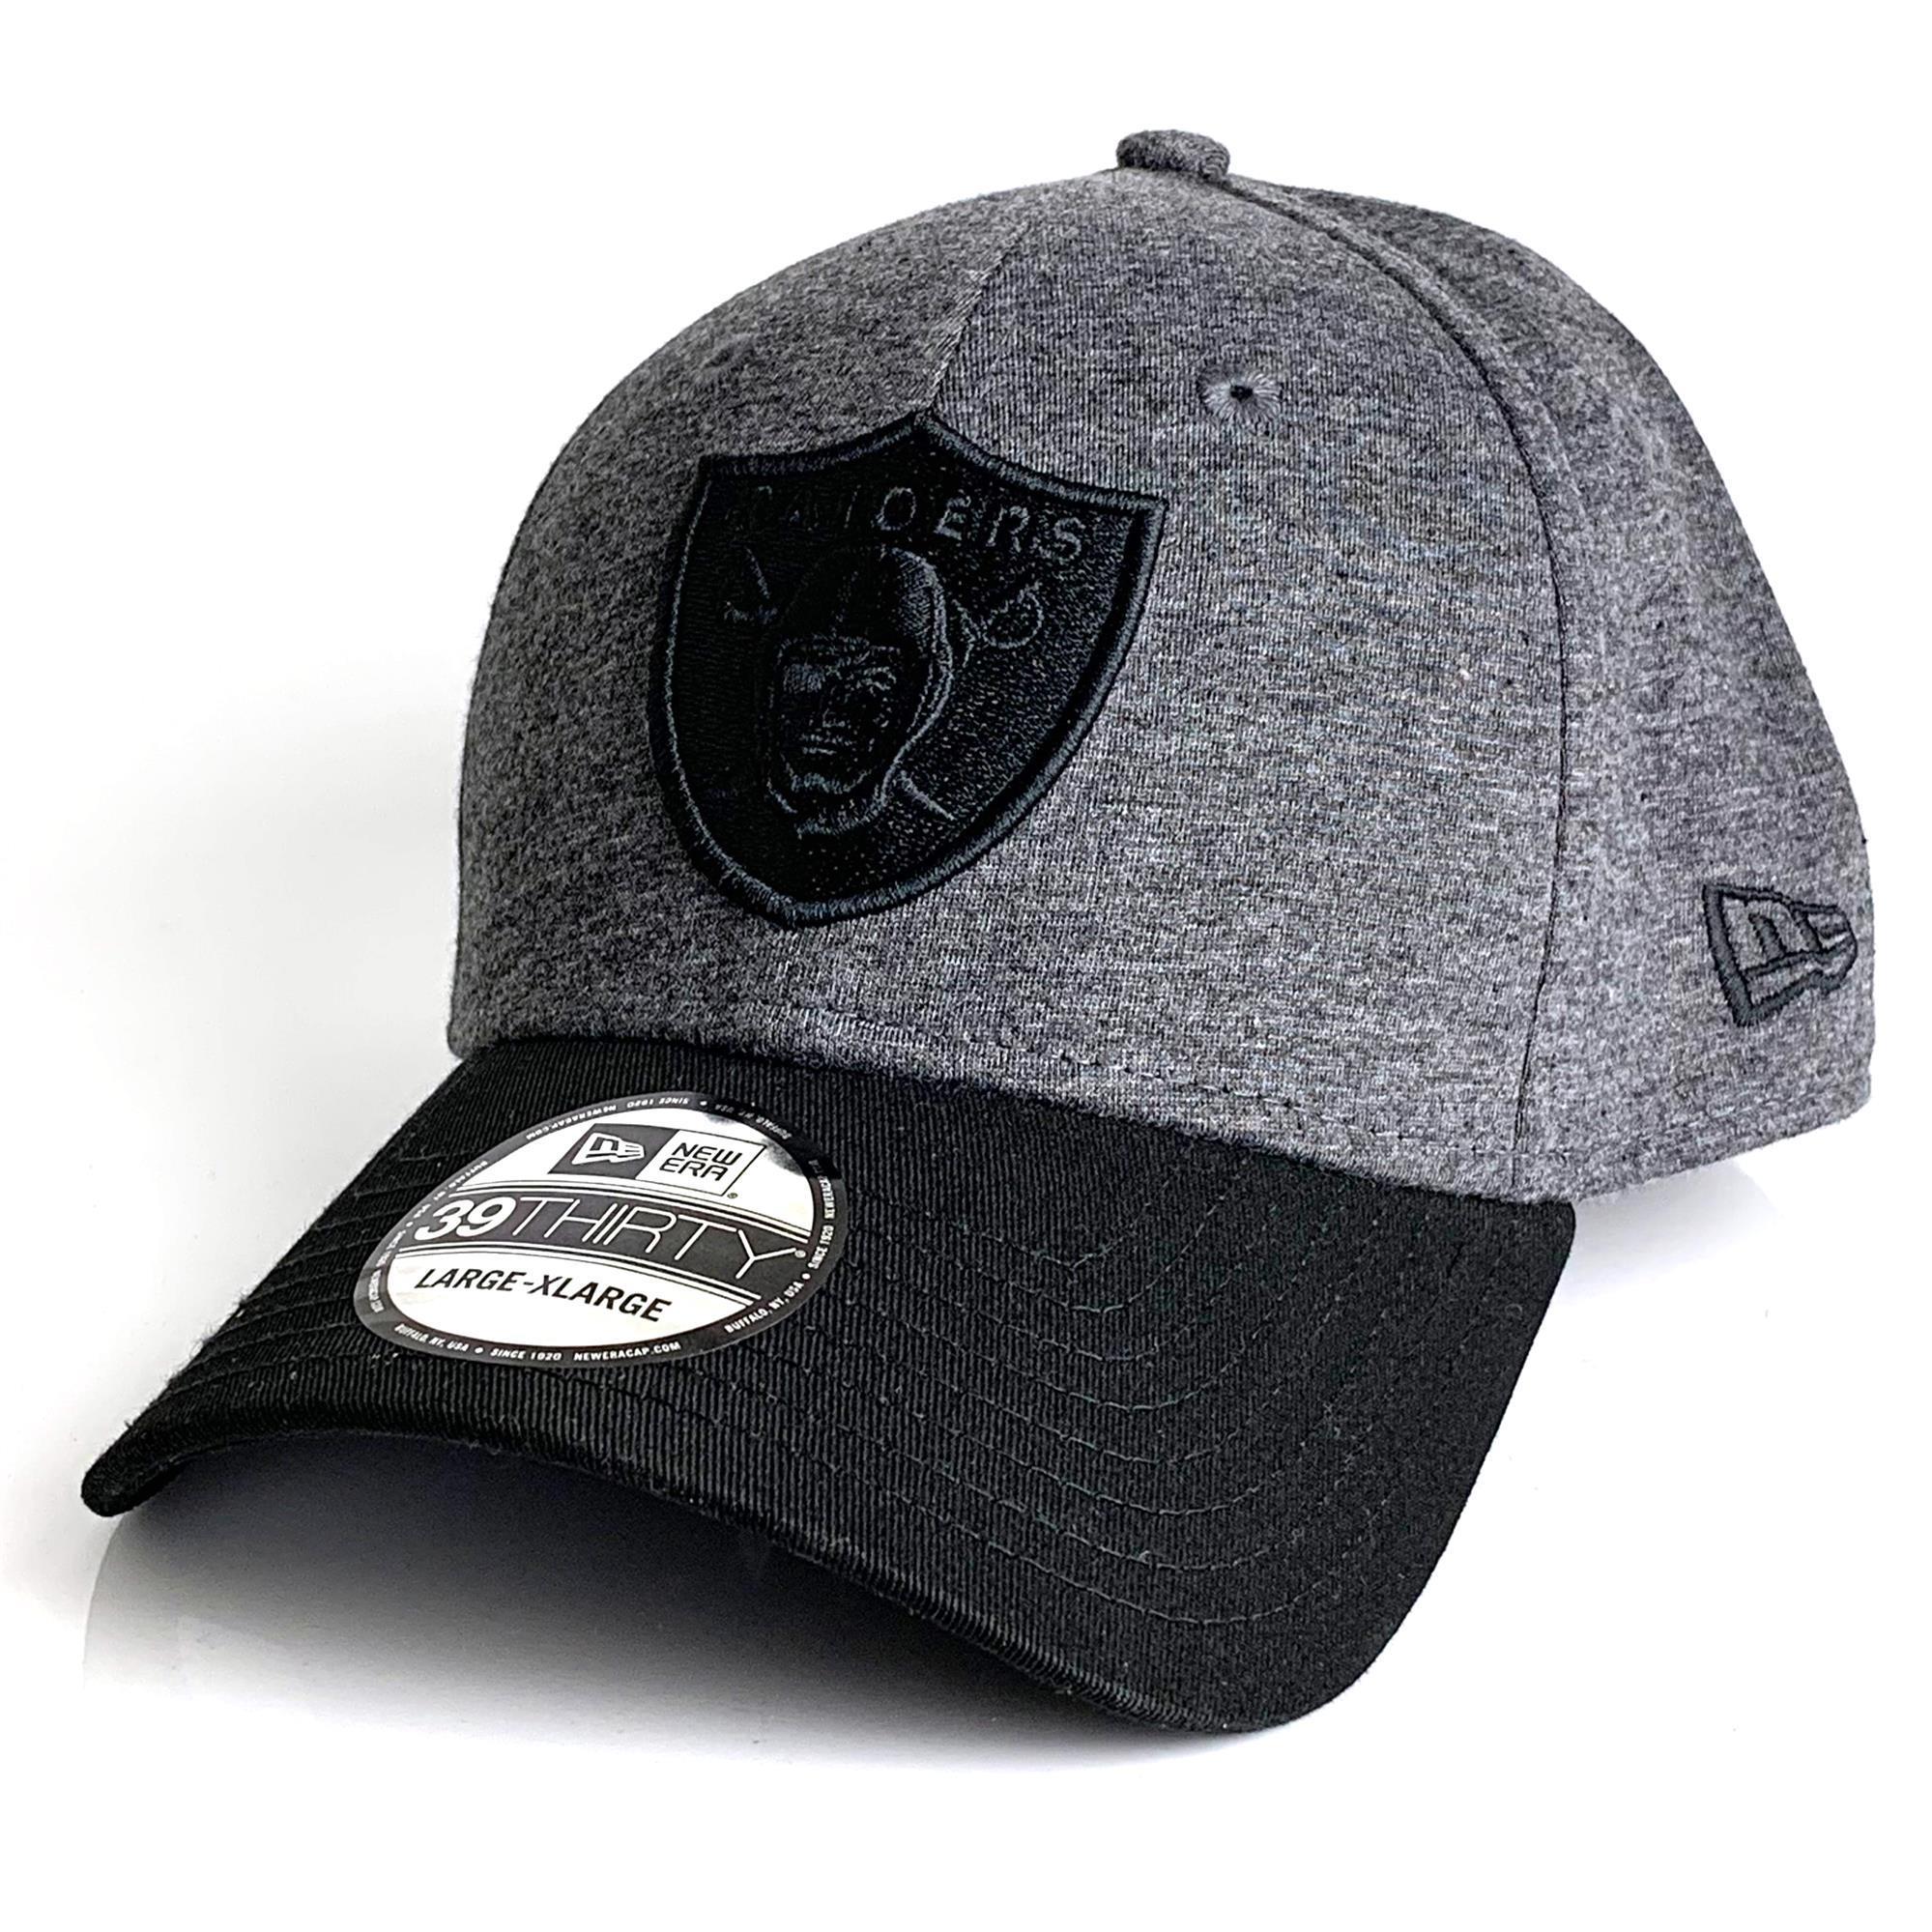 443c0ba34f4 New Era Men s Oakland Raiders 39 Thirty Cap - Black   Dark Grey BNWT ...